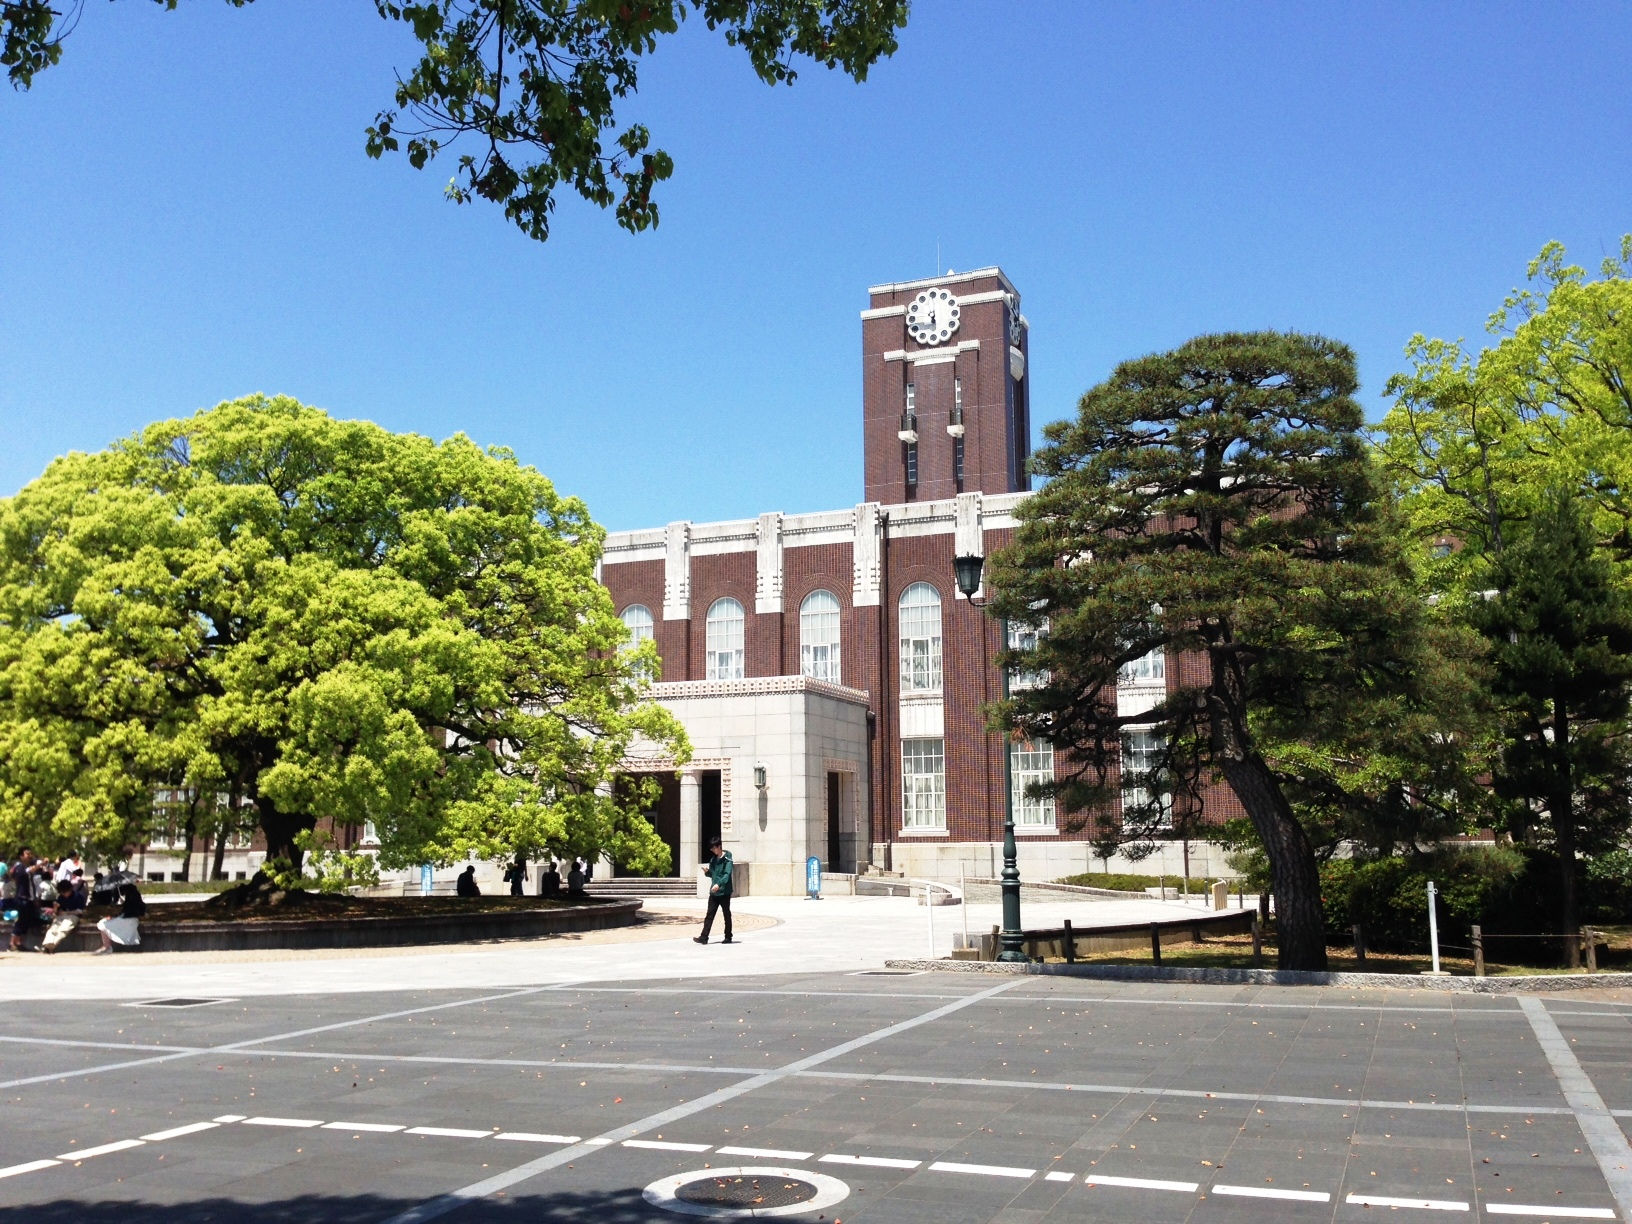 File:Kyoto University Clock Tower.jpg - Wikipedia